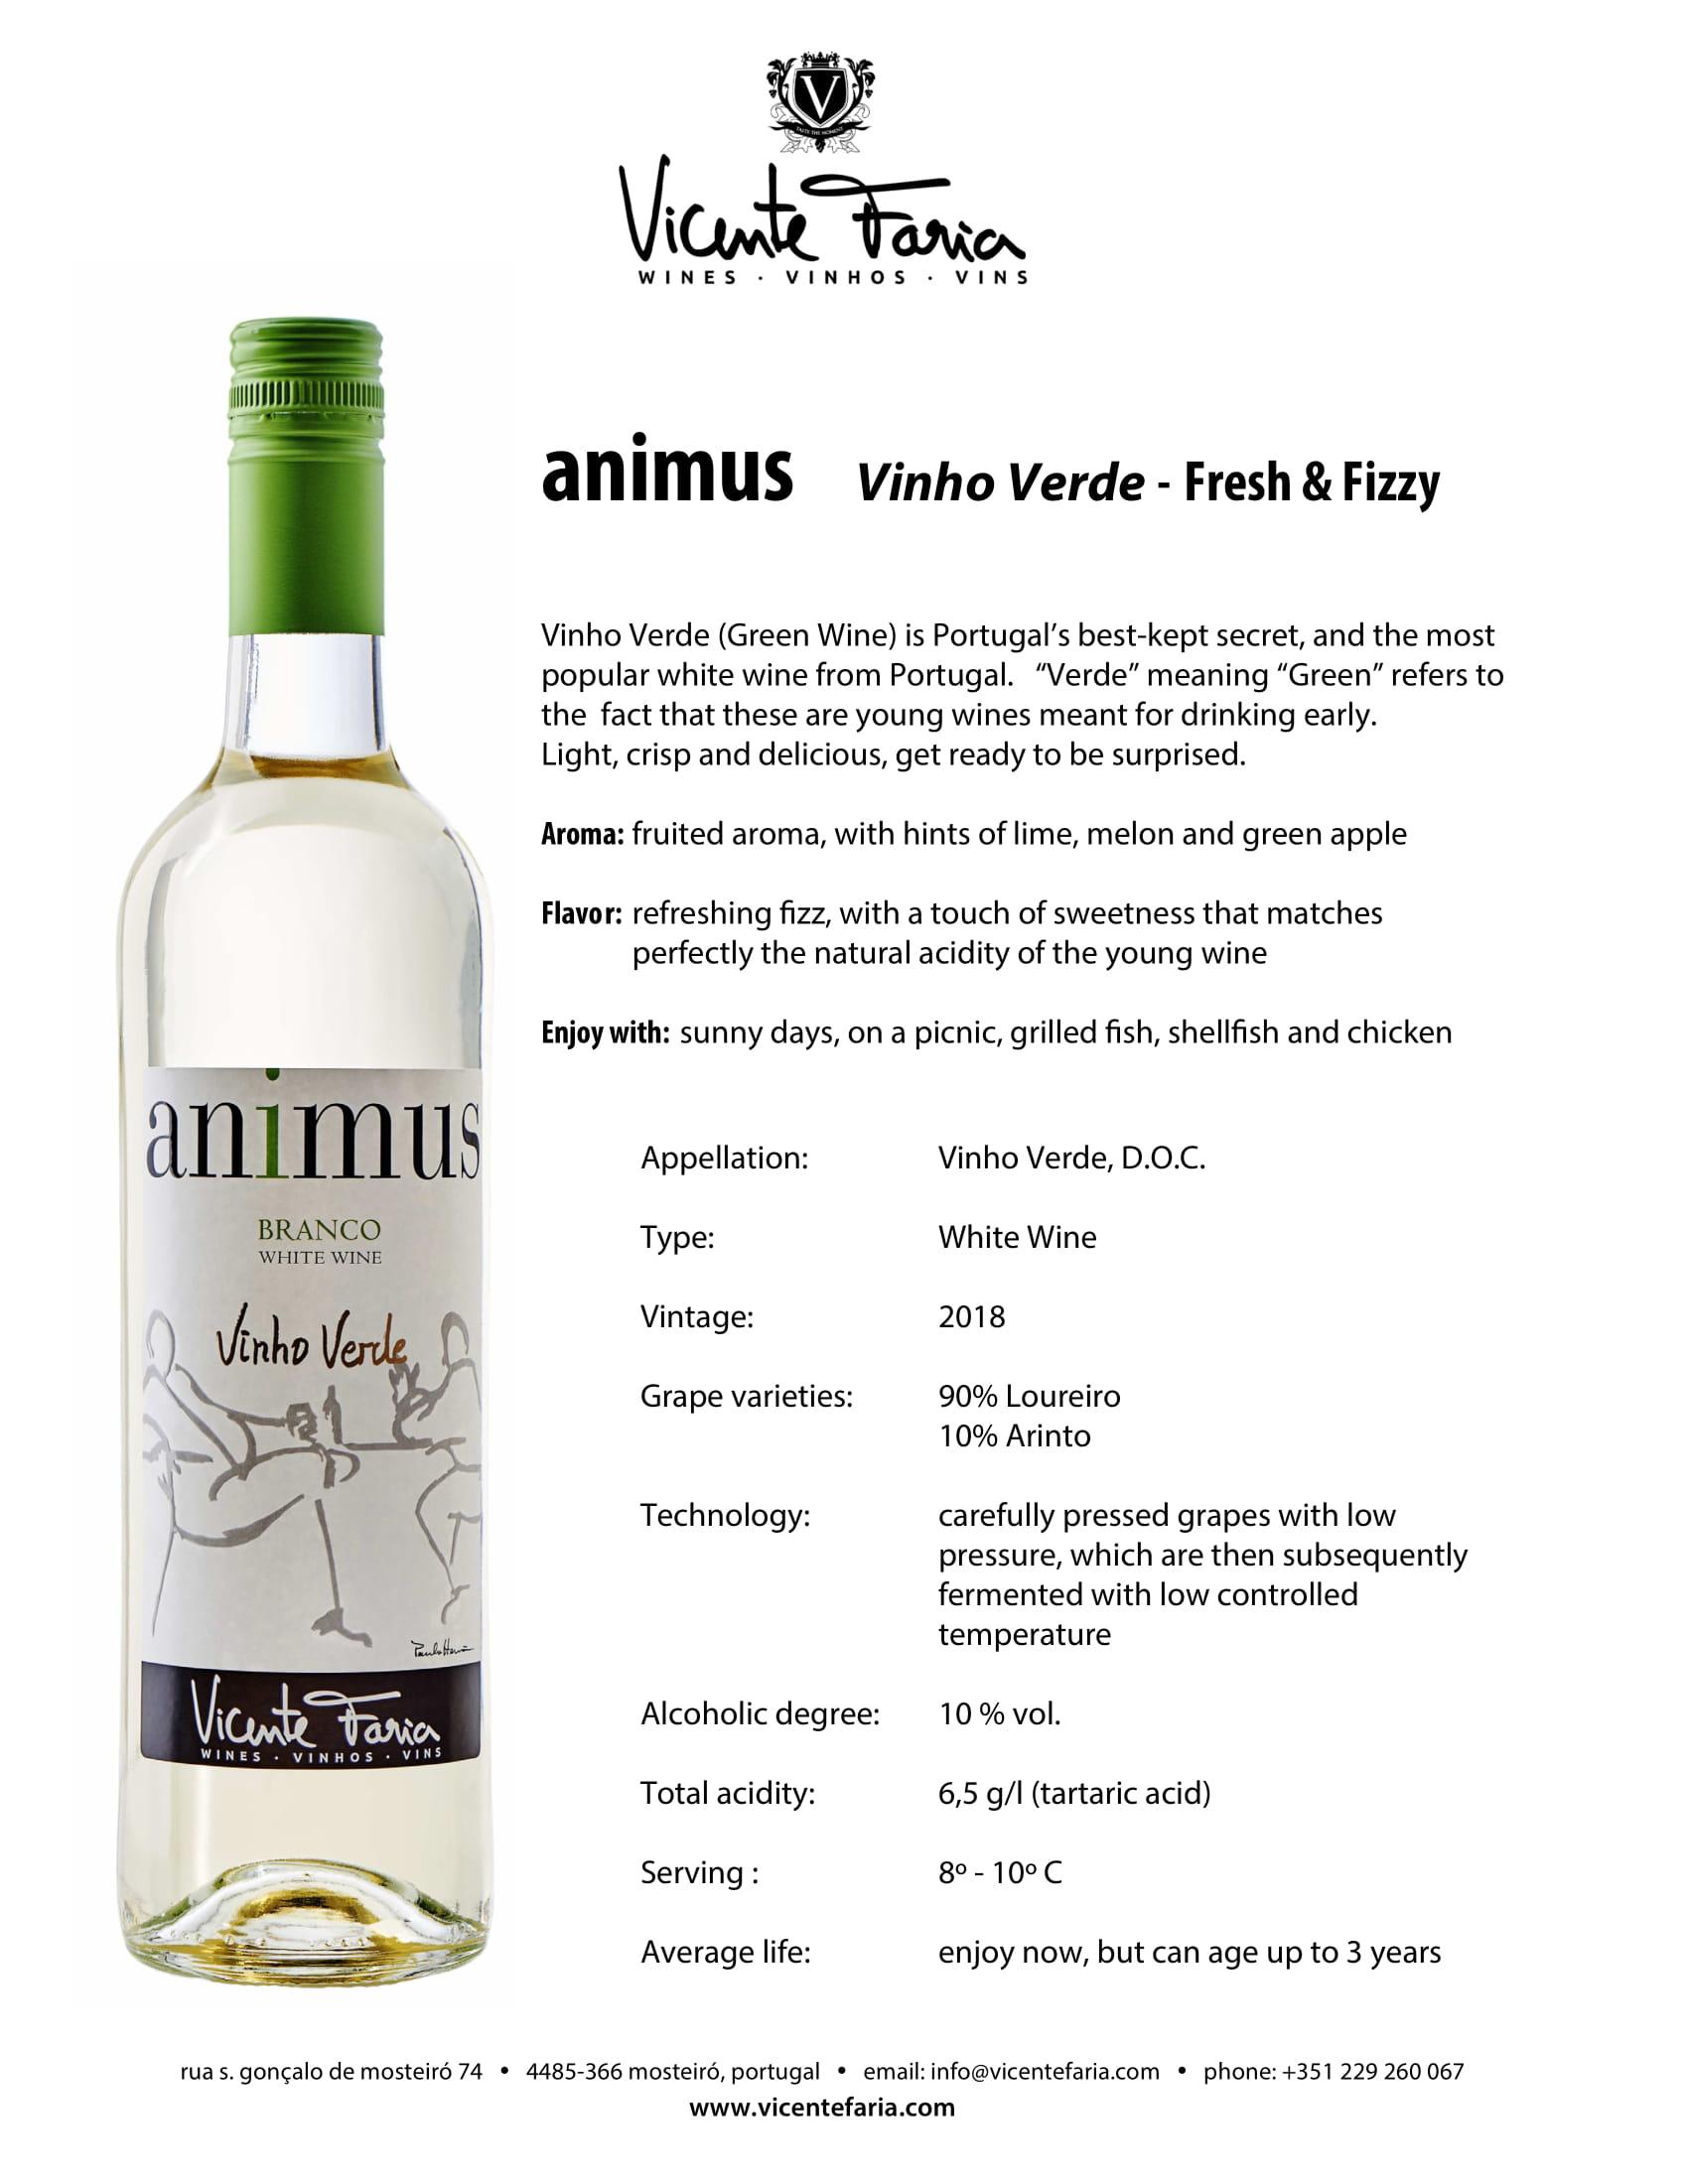 Animus Vinho Verde Tech Sheet